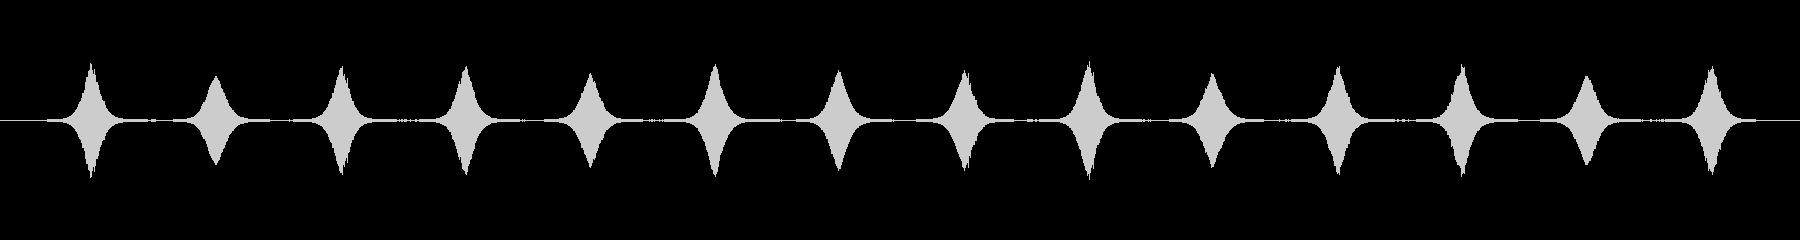 SPINNING SPACE DO...の未再生の波形